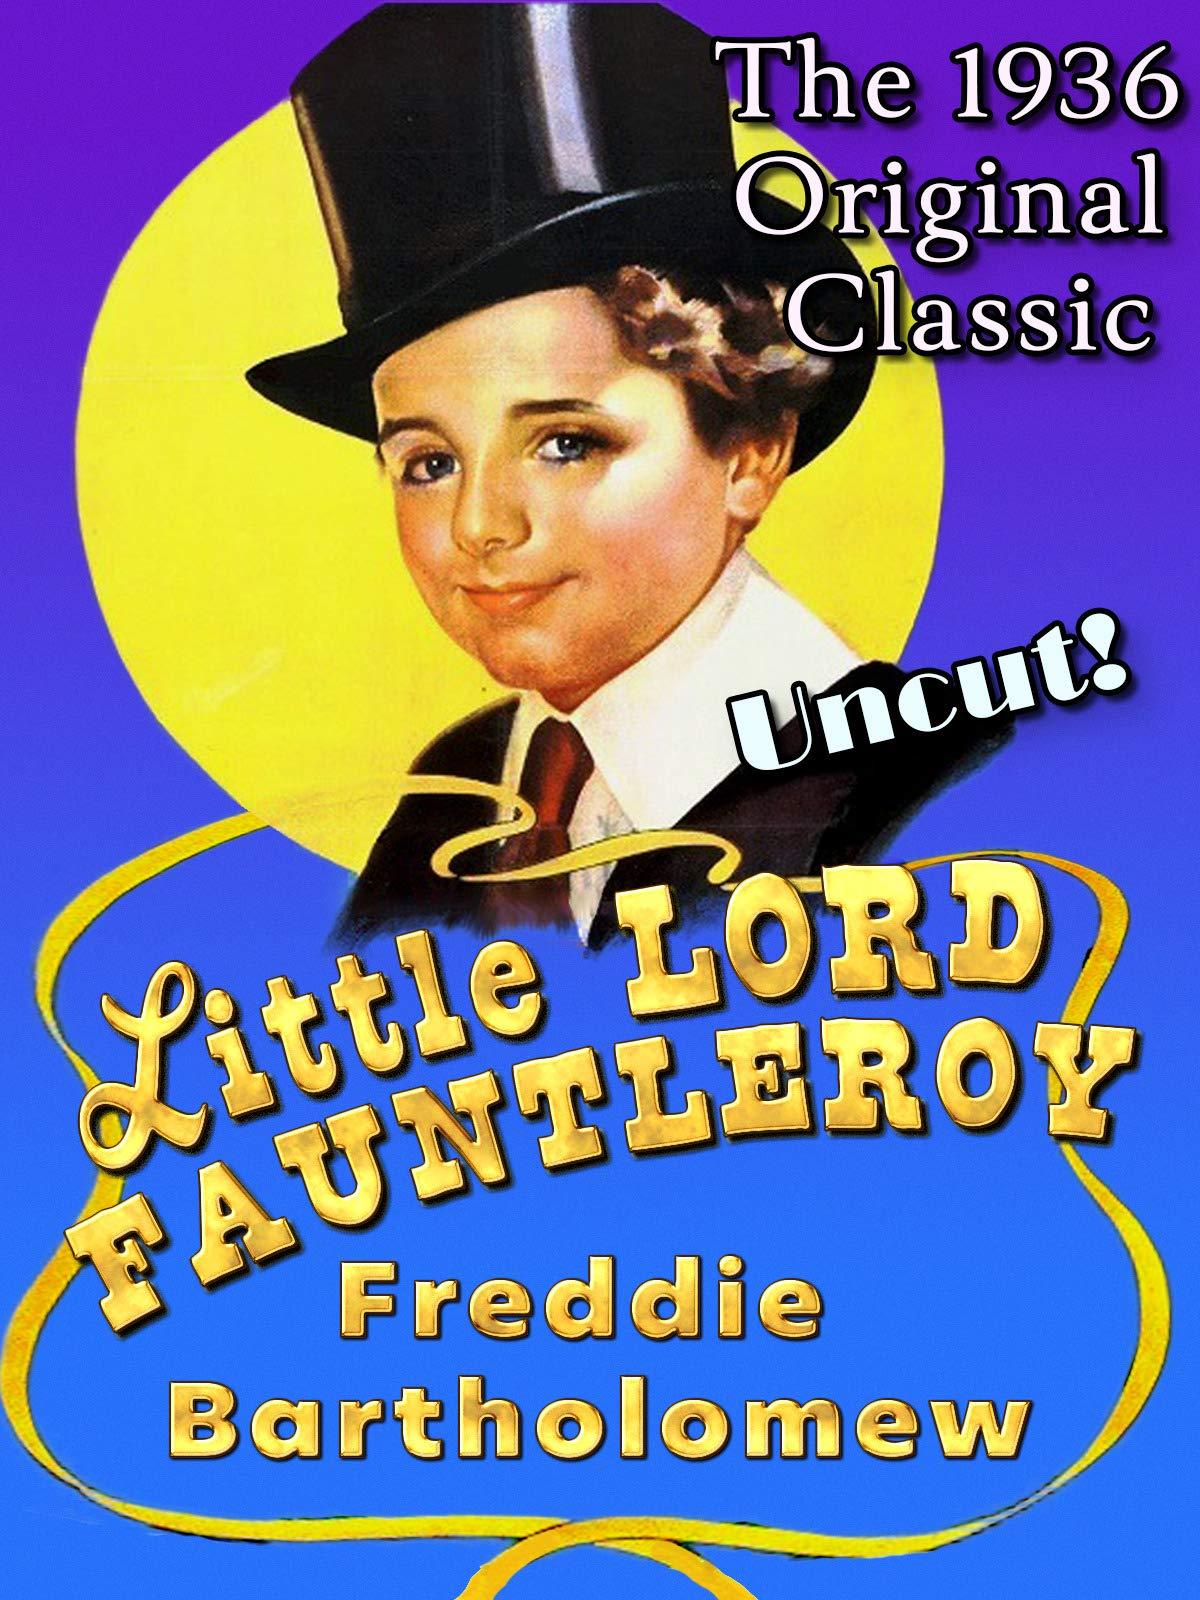 Little Lord Fauntleroy - Freddie Bartholomew, The 1936 Original Classic, Uncut!